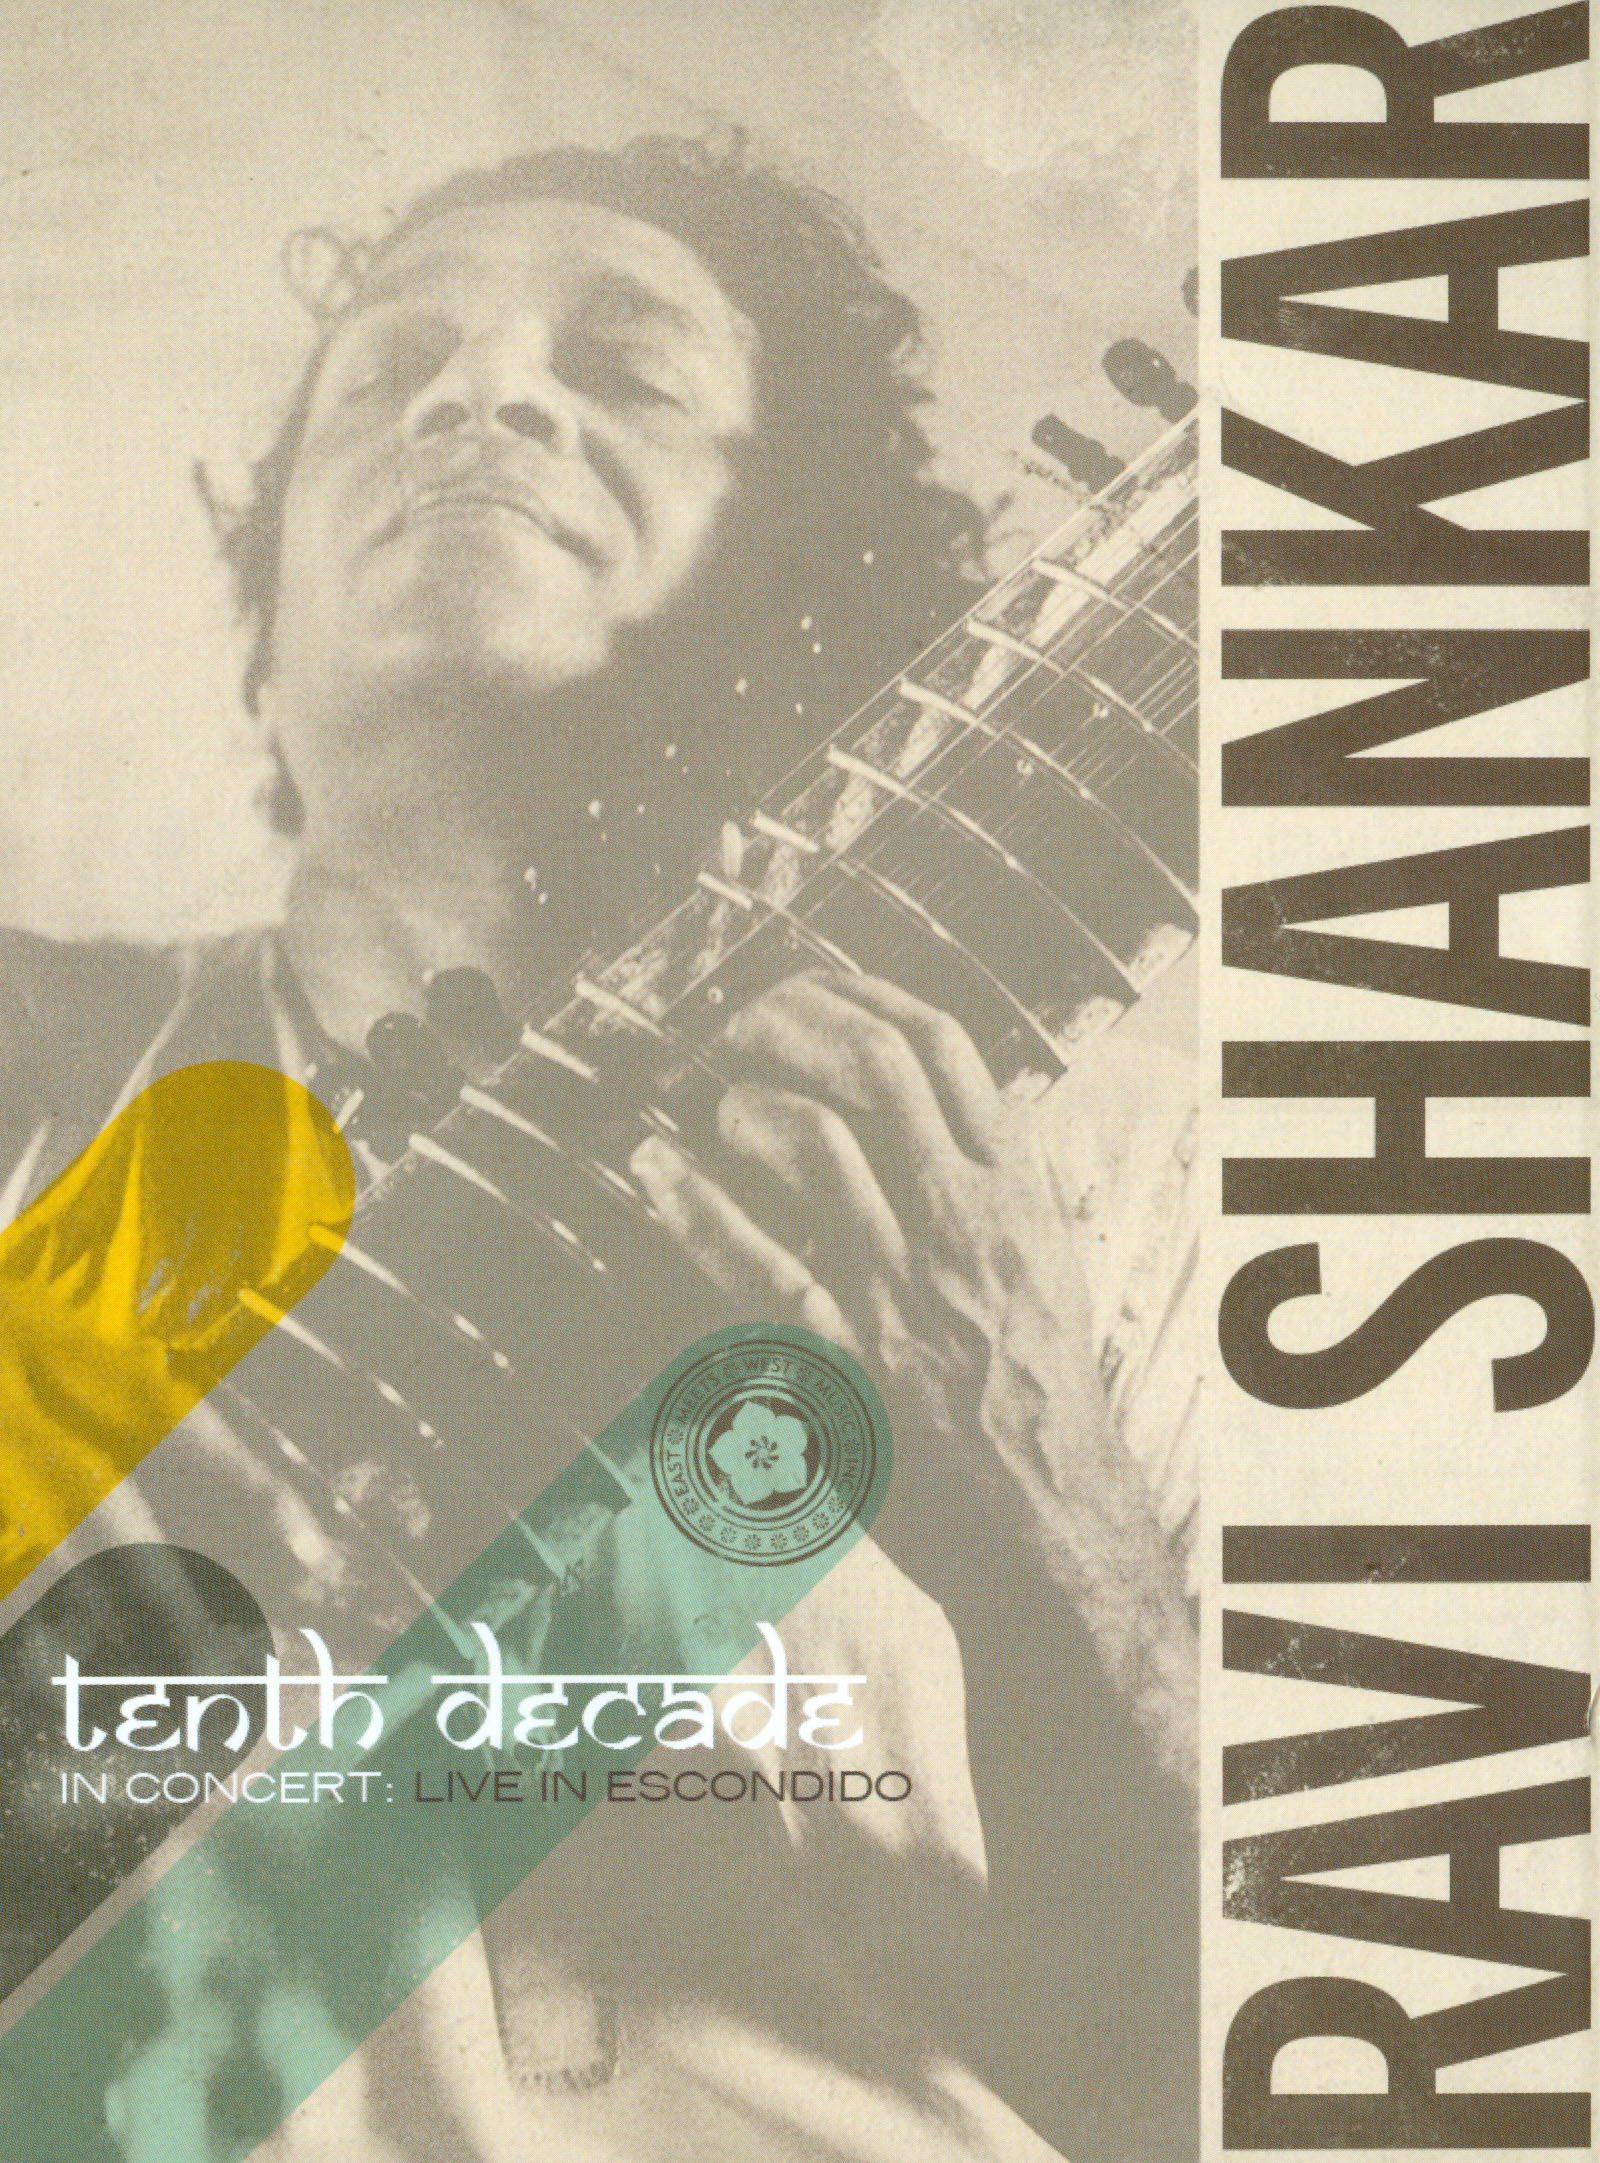 Ravi Shankar: Tenth Decade - Live in Escondido